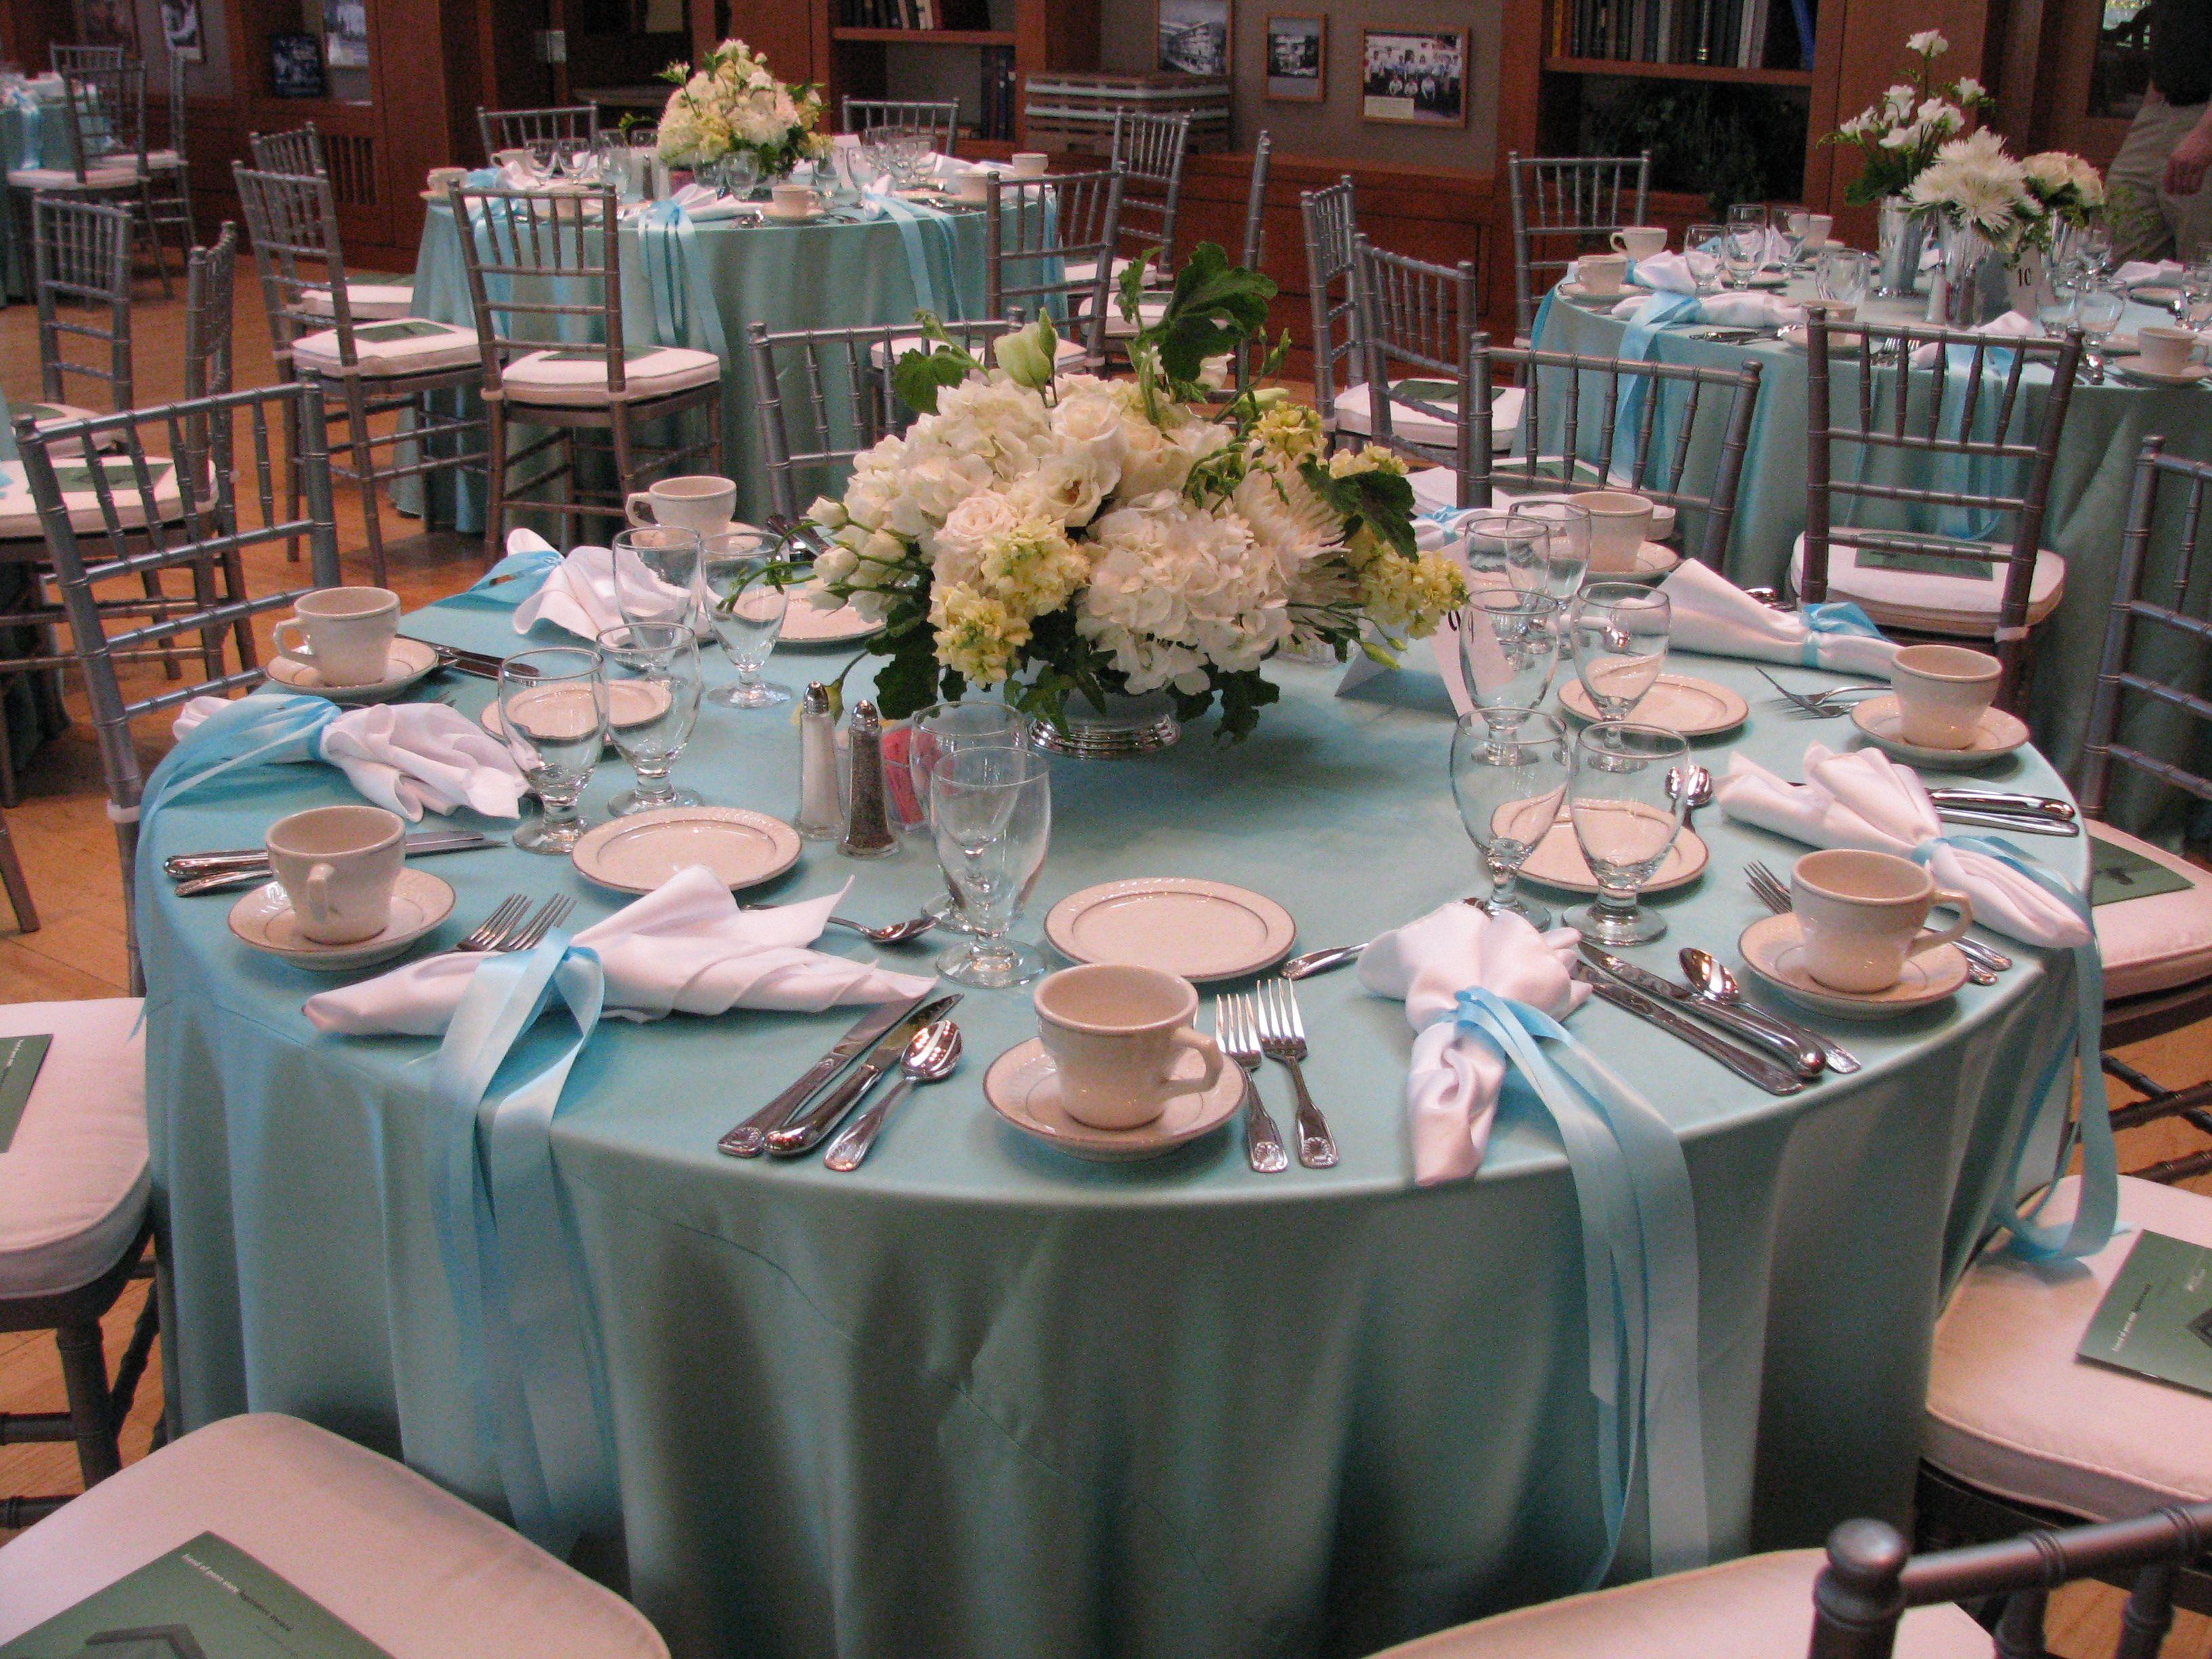 Tiffany Blue themed luncheon using Tiffany Blue satin tablecloths